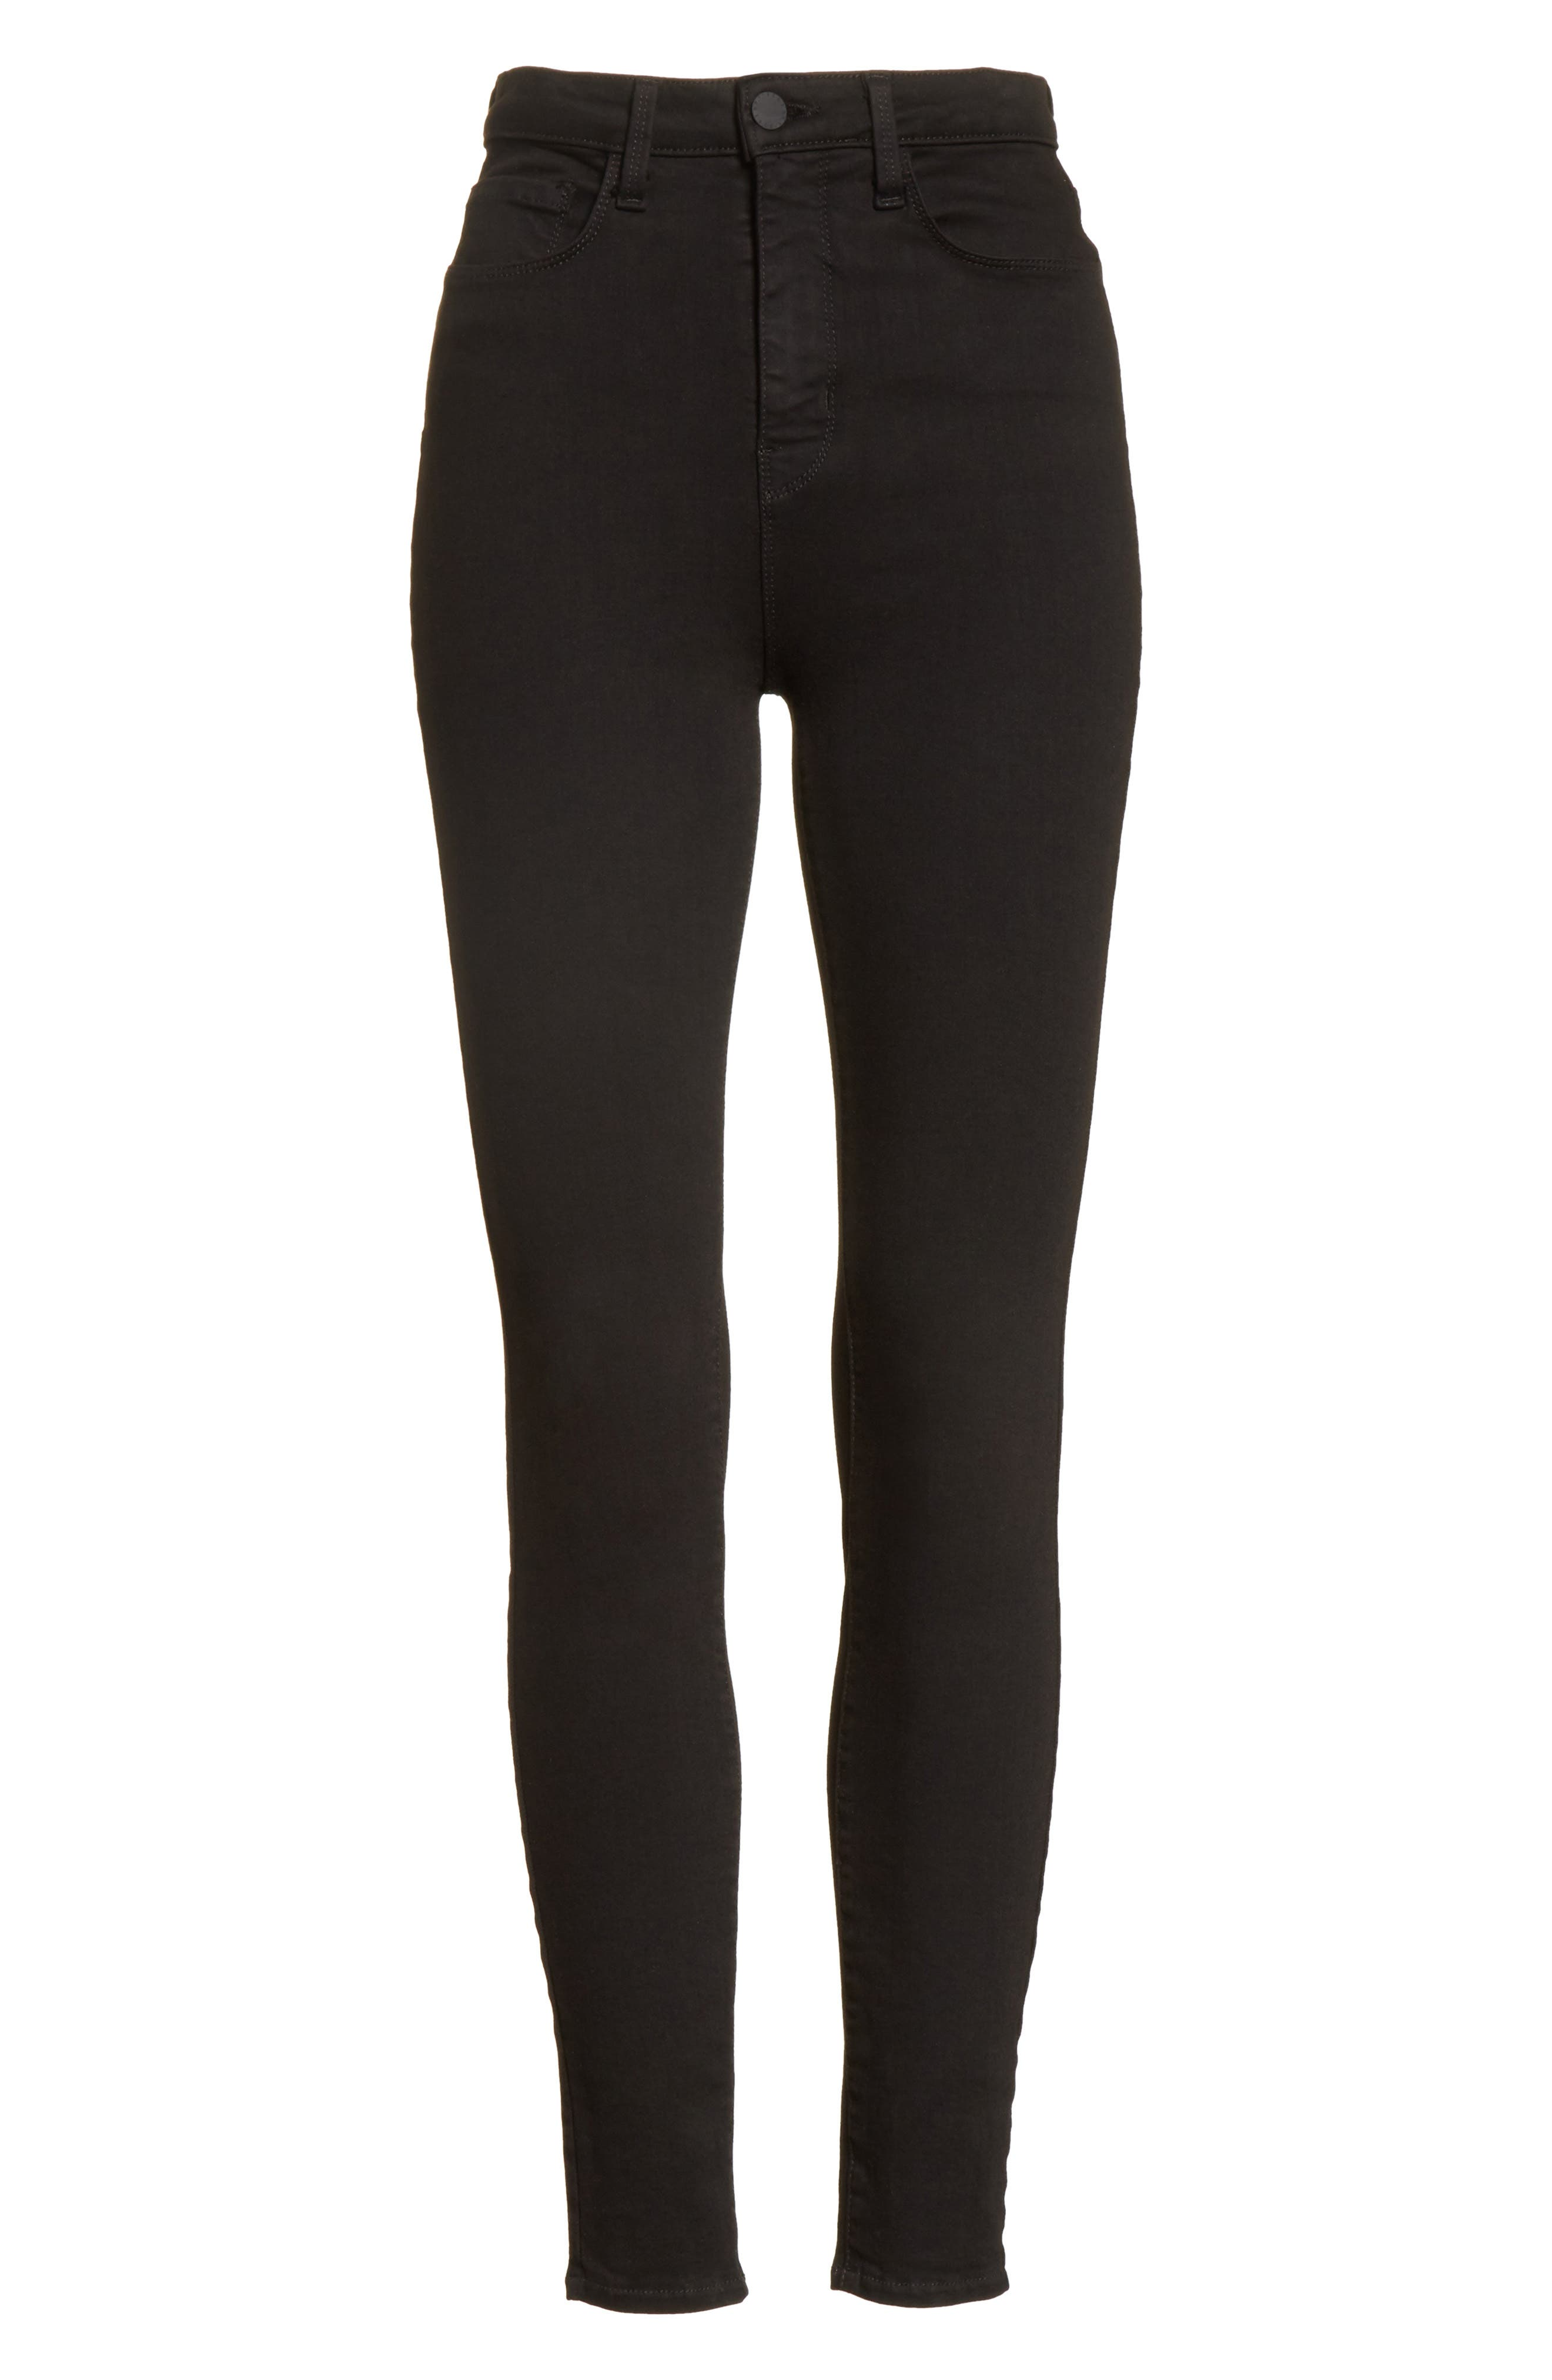 Katrina Ultra High Waist Skinny Jeans,                             Alternate thumbnail 6, color,                             Noir